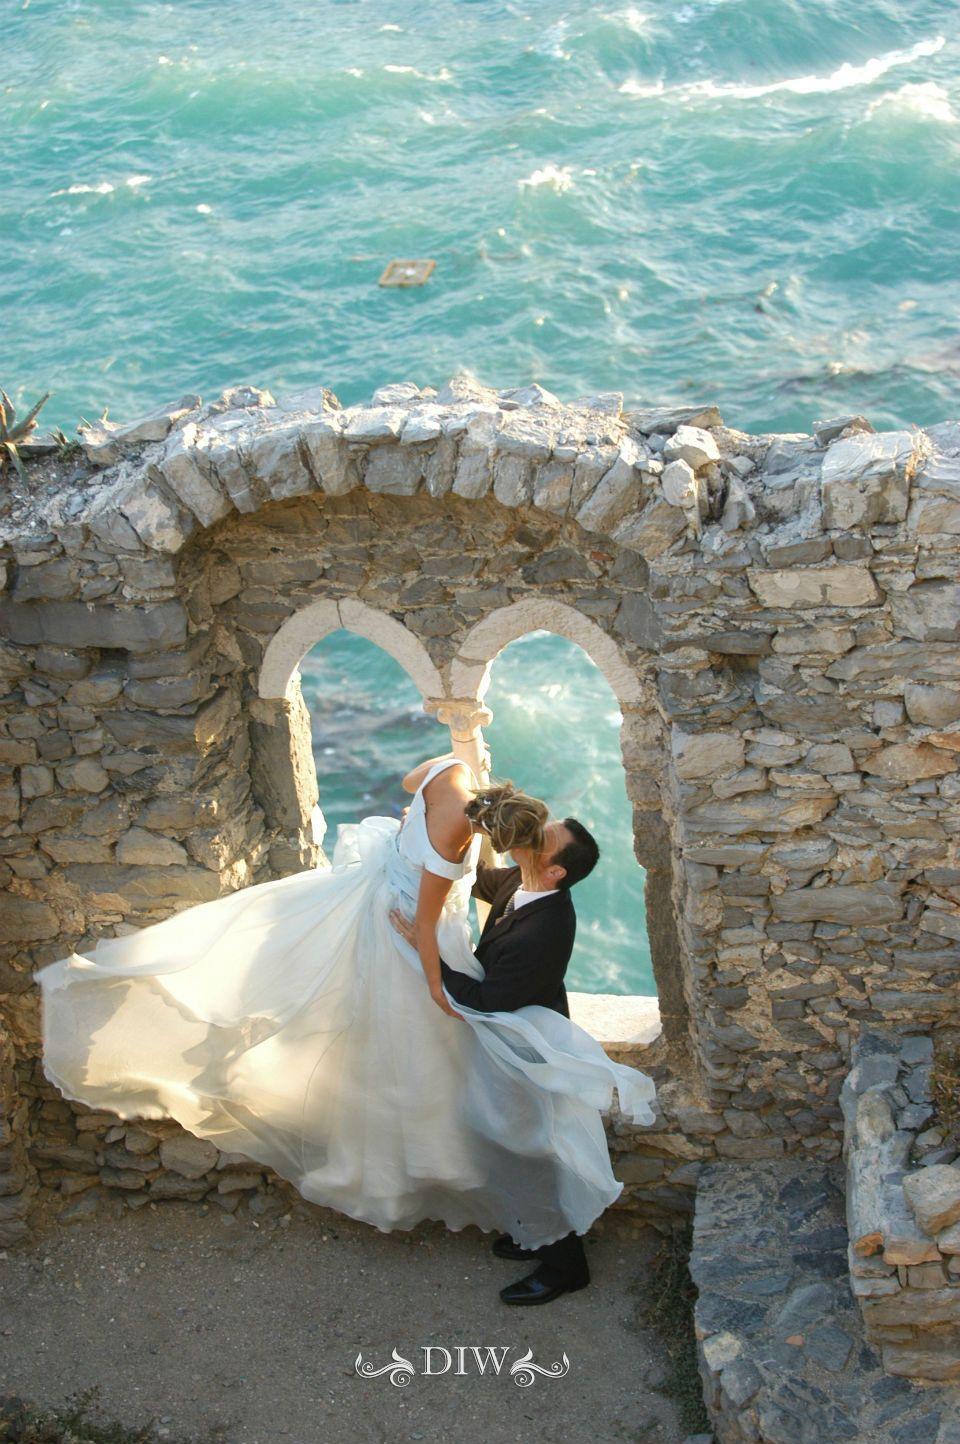 weddings beach italy locations outdoor italian sea destination romantic venue outside venues tuscany seaside dress ceremonies bridal saved reception gowns